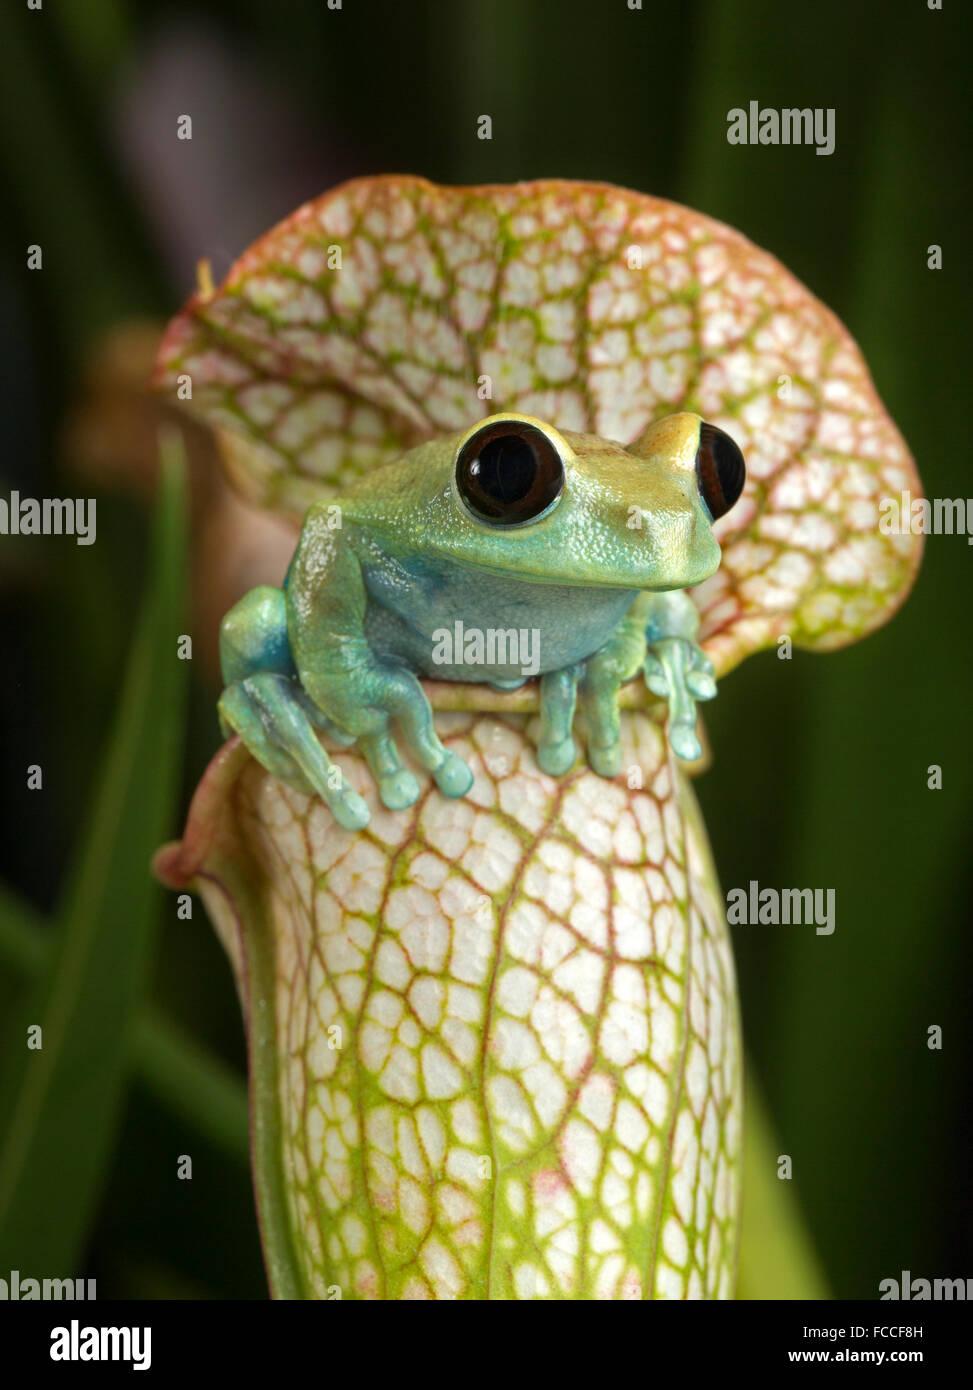 Maroon Eyed Tree Frog on White Pitcher Plant - Stock Image